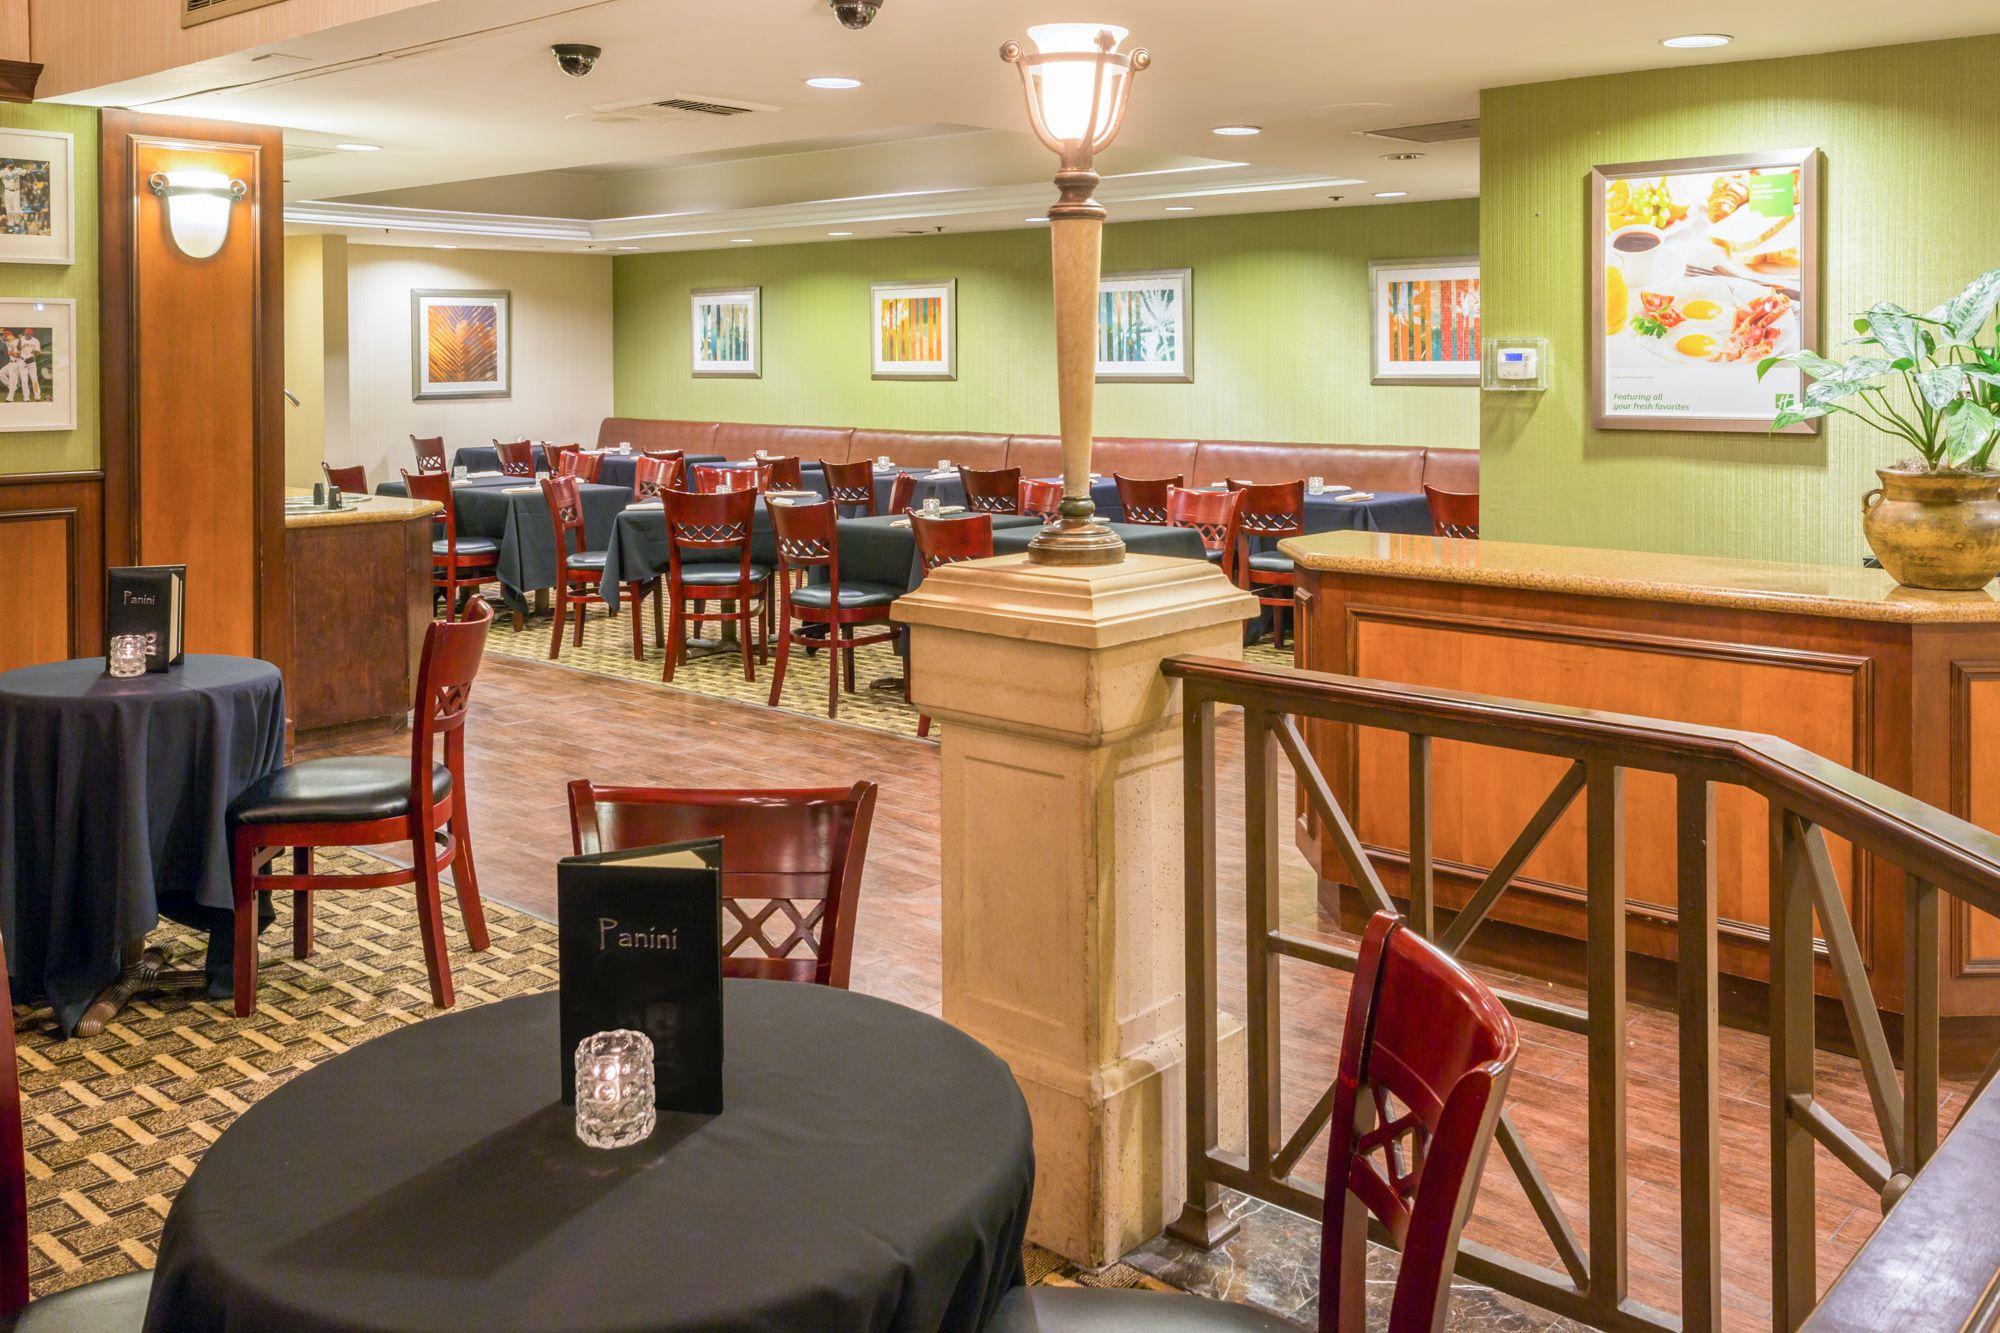 Panini Restaurant Located Inside The Holiday Inn Orange County Airport   Santa Ana! A Convenient